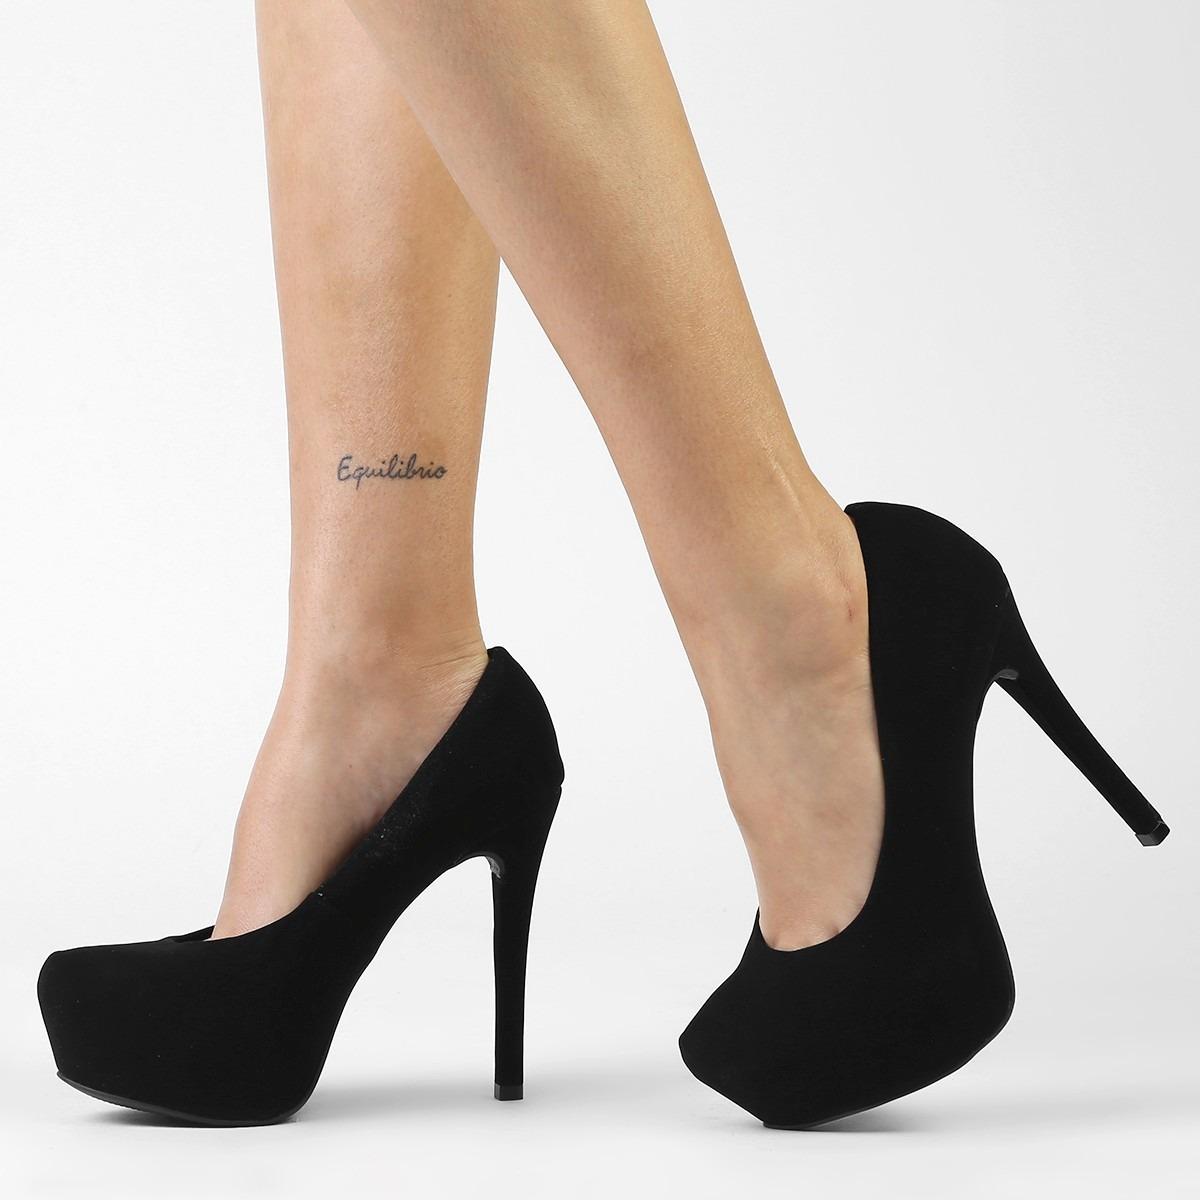 430f25482 Sapato Salto Alto Scarpin Crysalis -pronta Intrega - R  135